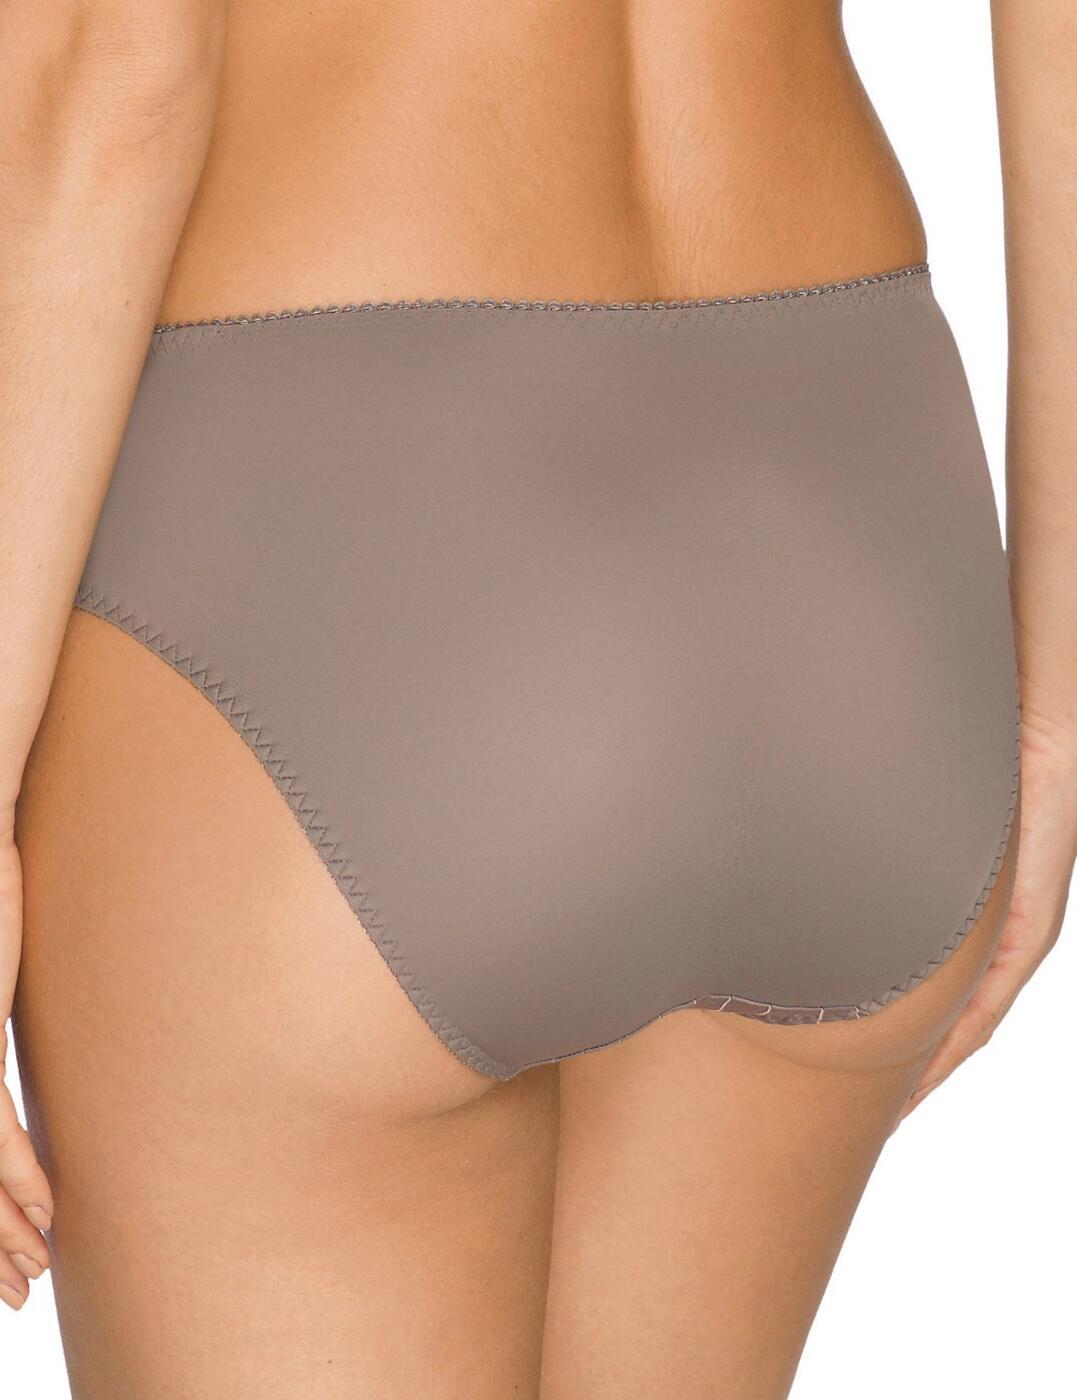 Prima-Donna-Deauville-Volle-Unterhose-Slip-Slips-Pant-0561811-Luxus-Dessous Indexbild 30